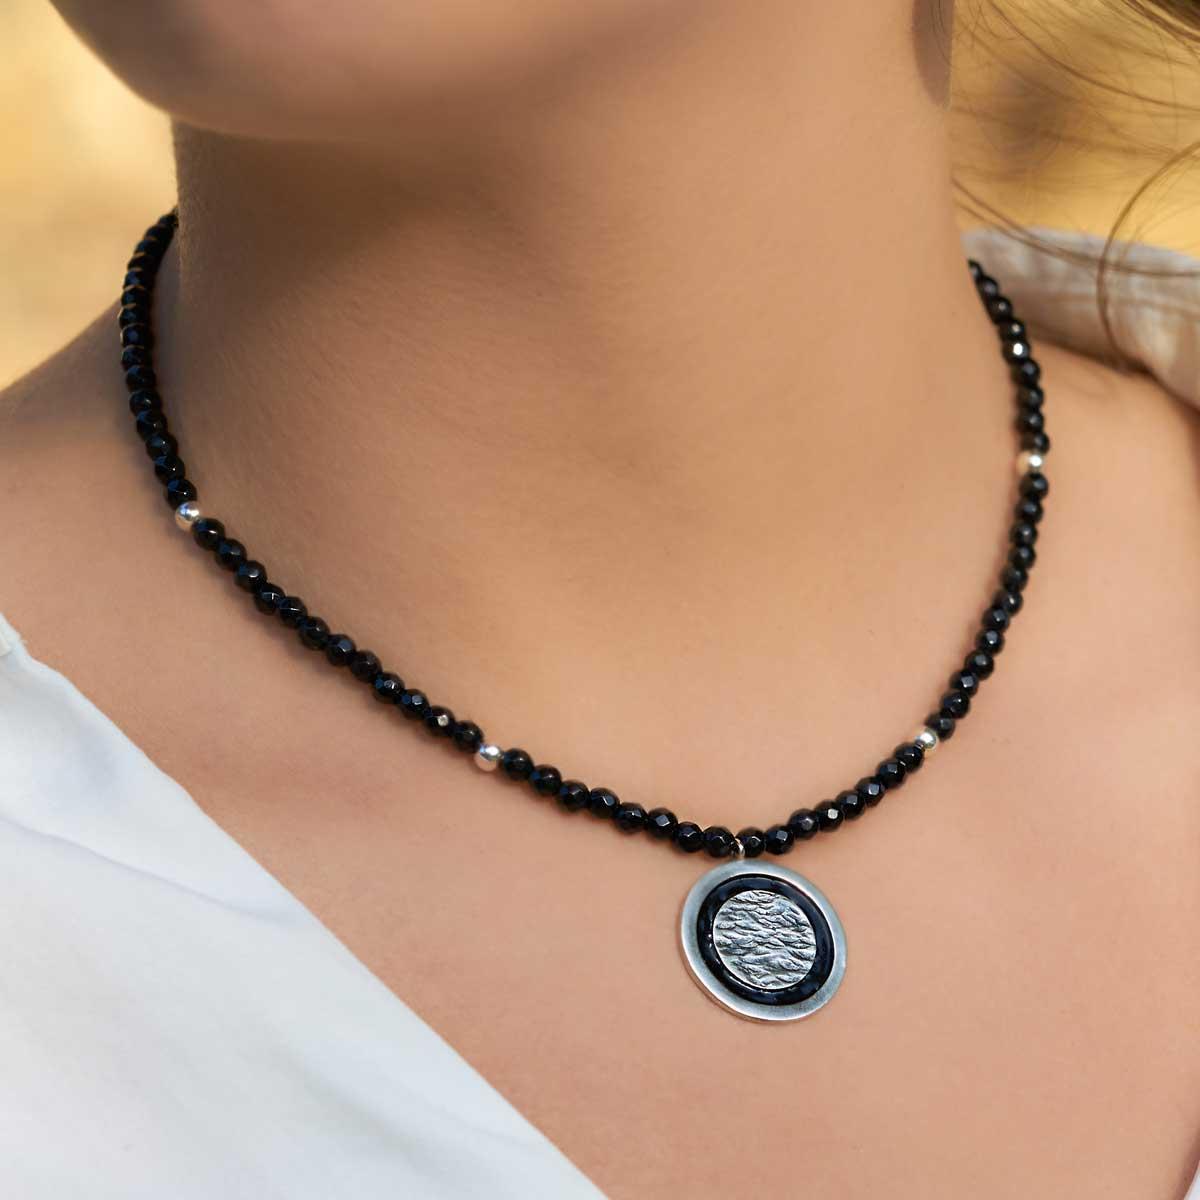 Collar de plata modelo Lúa, plata, ónix, esmalte al fuego, Joyas Siliva.